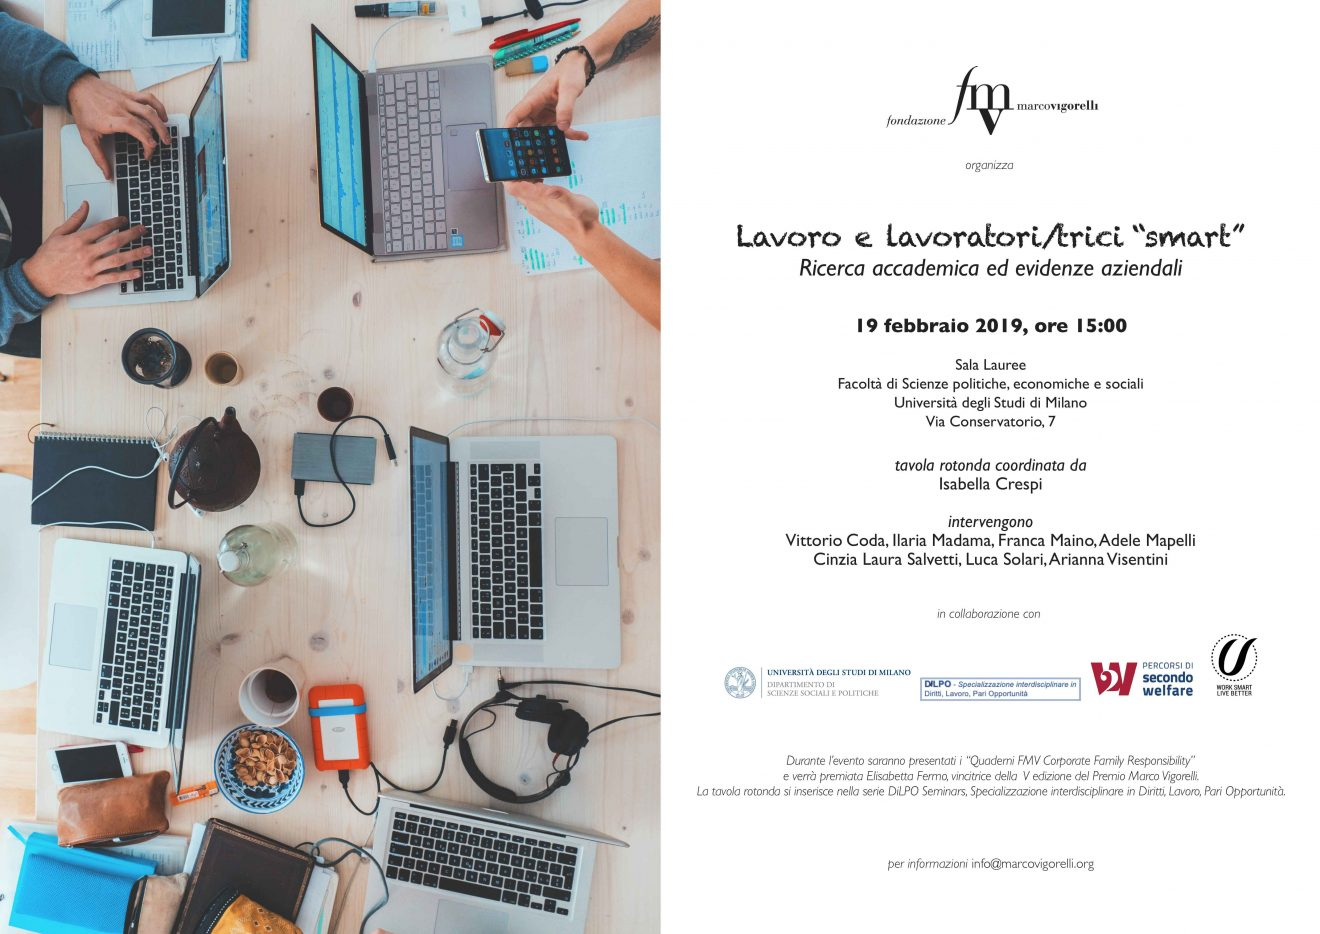 locandina_smartworking 1